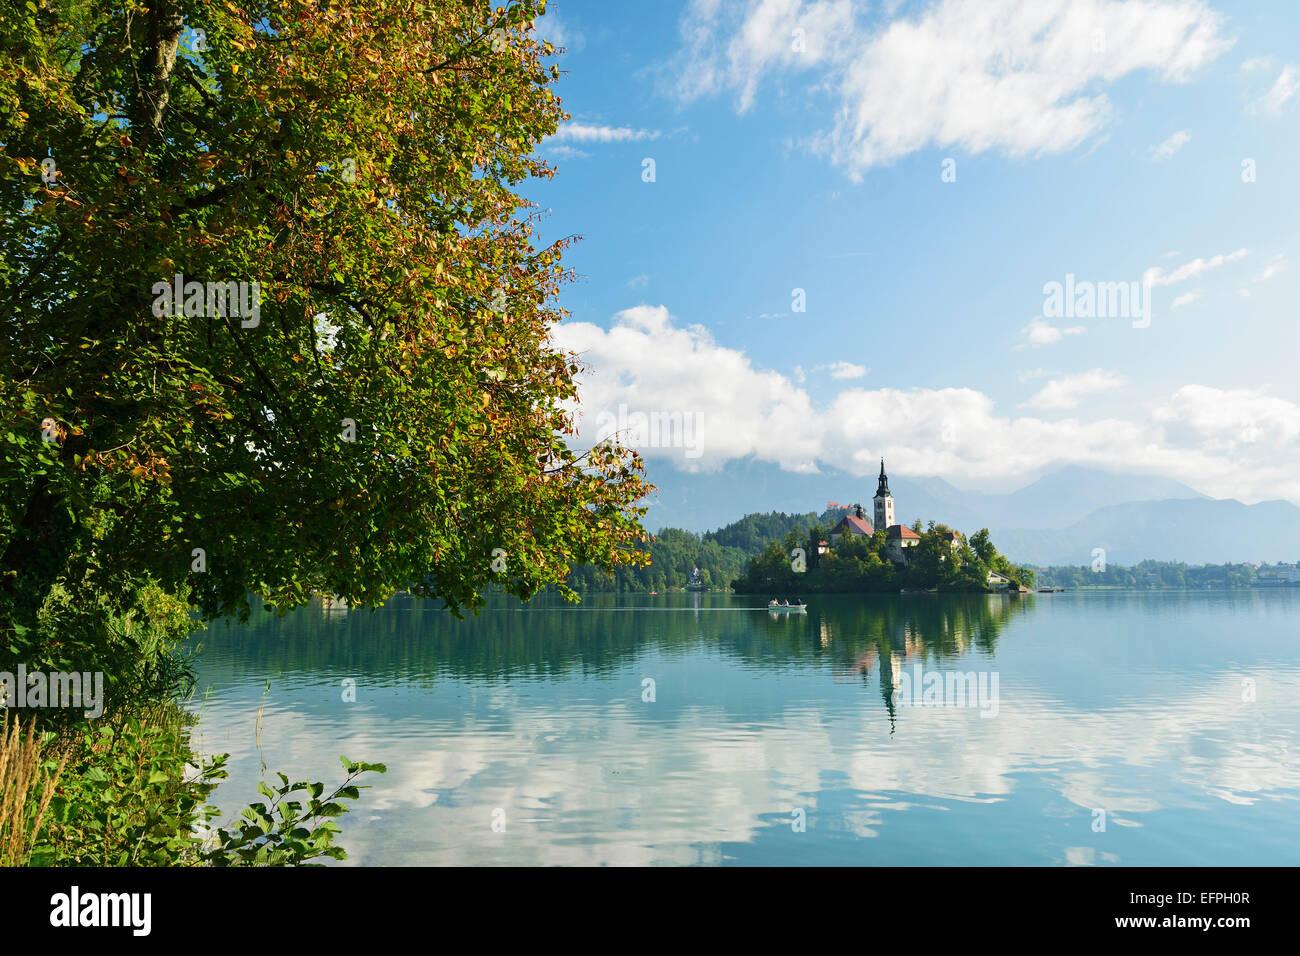 Lake Bled (Blejsko jezero), Bled, Julian Alps, Slovenia, Europe Stock Photo